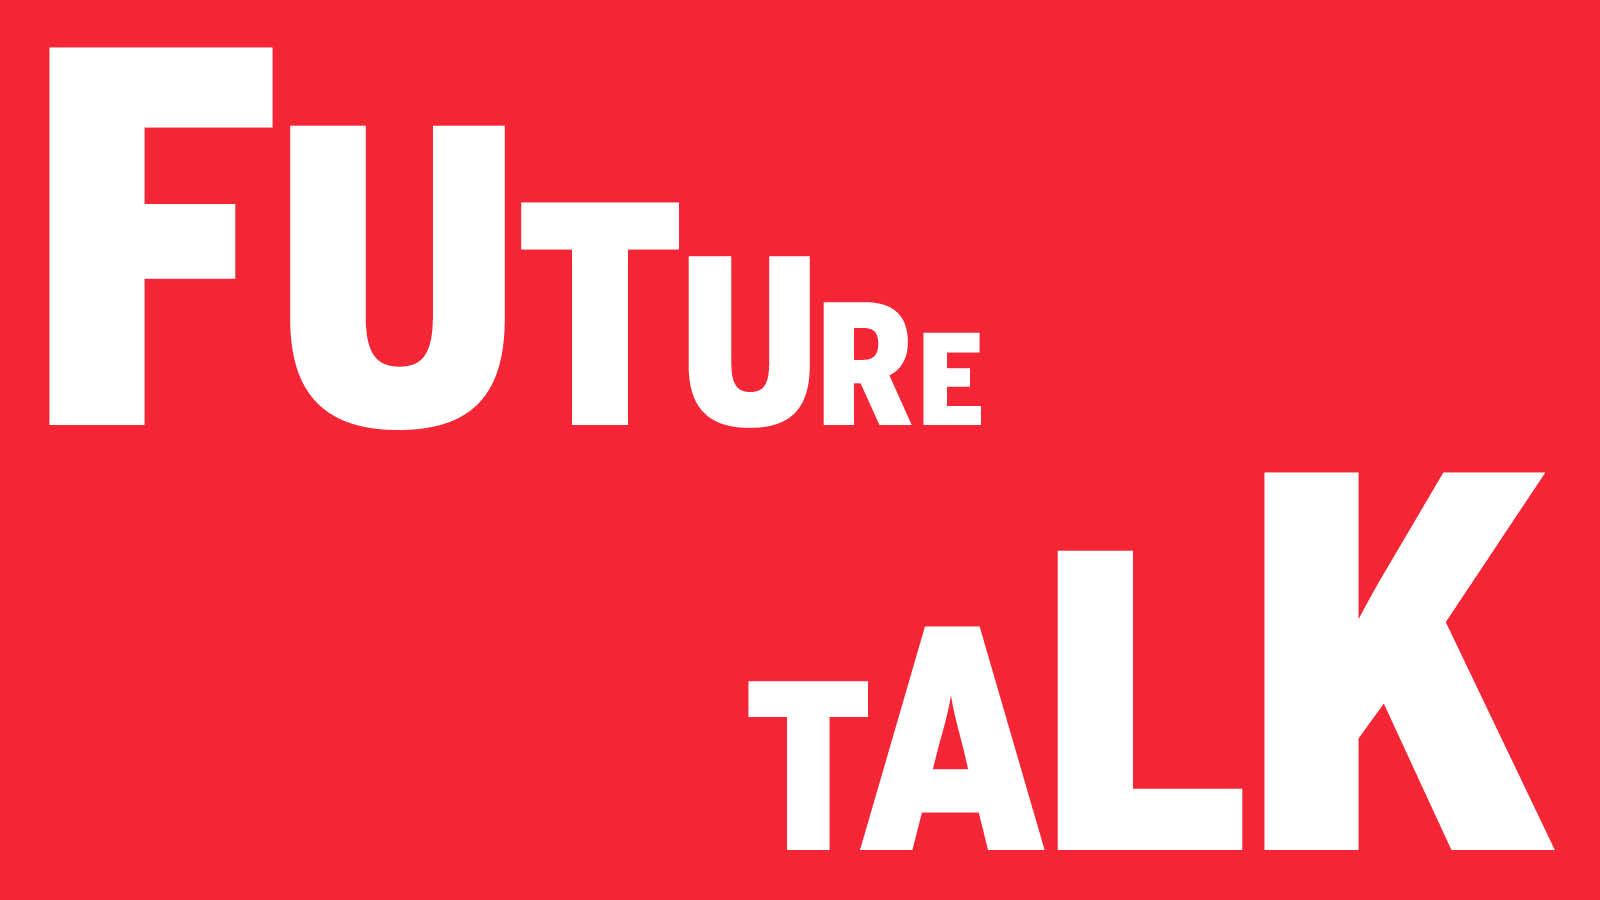 UICA Future Talk Artprize Exhibition